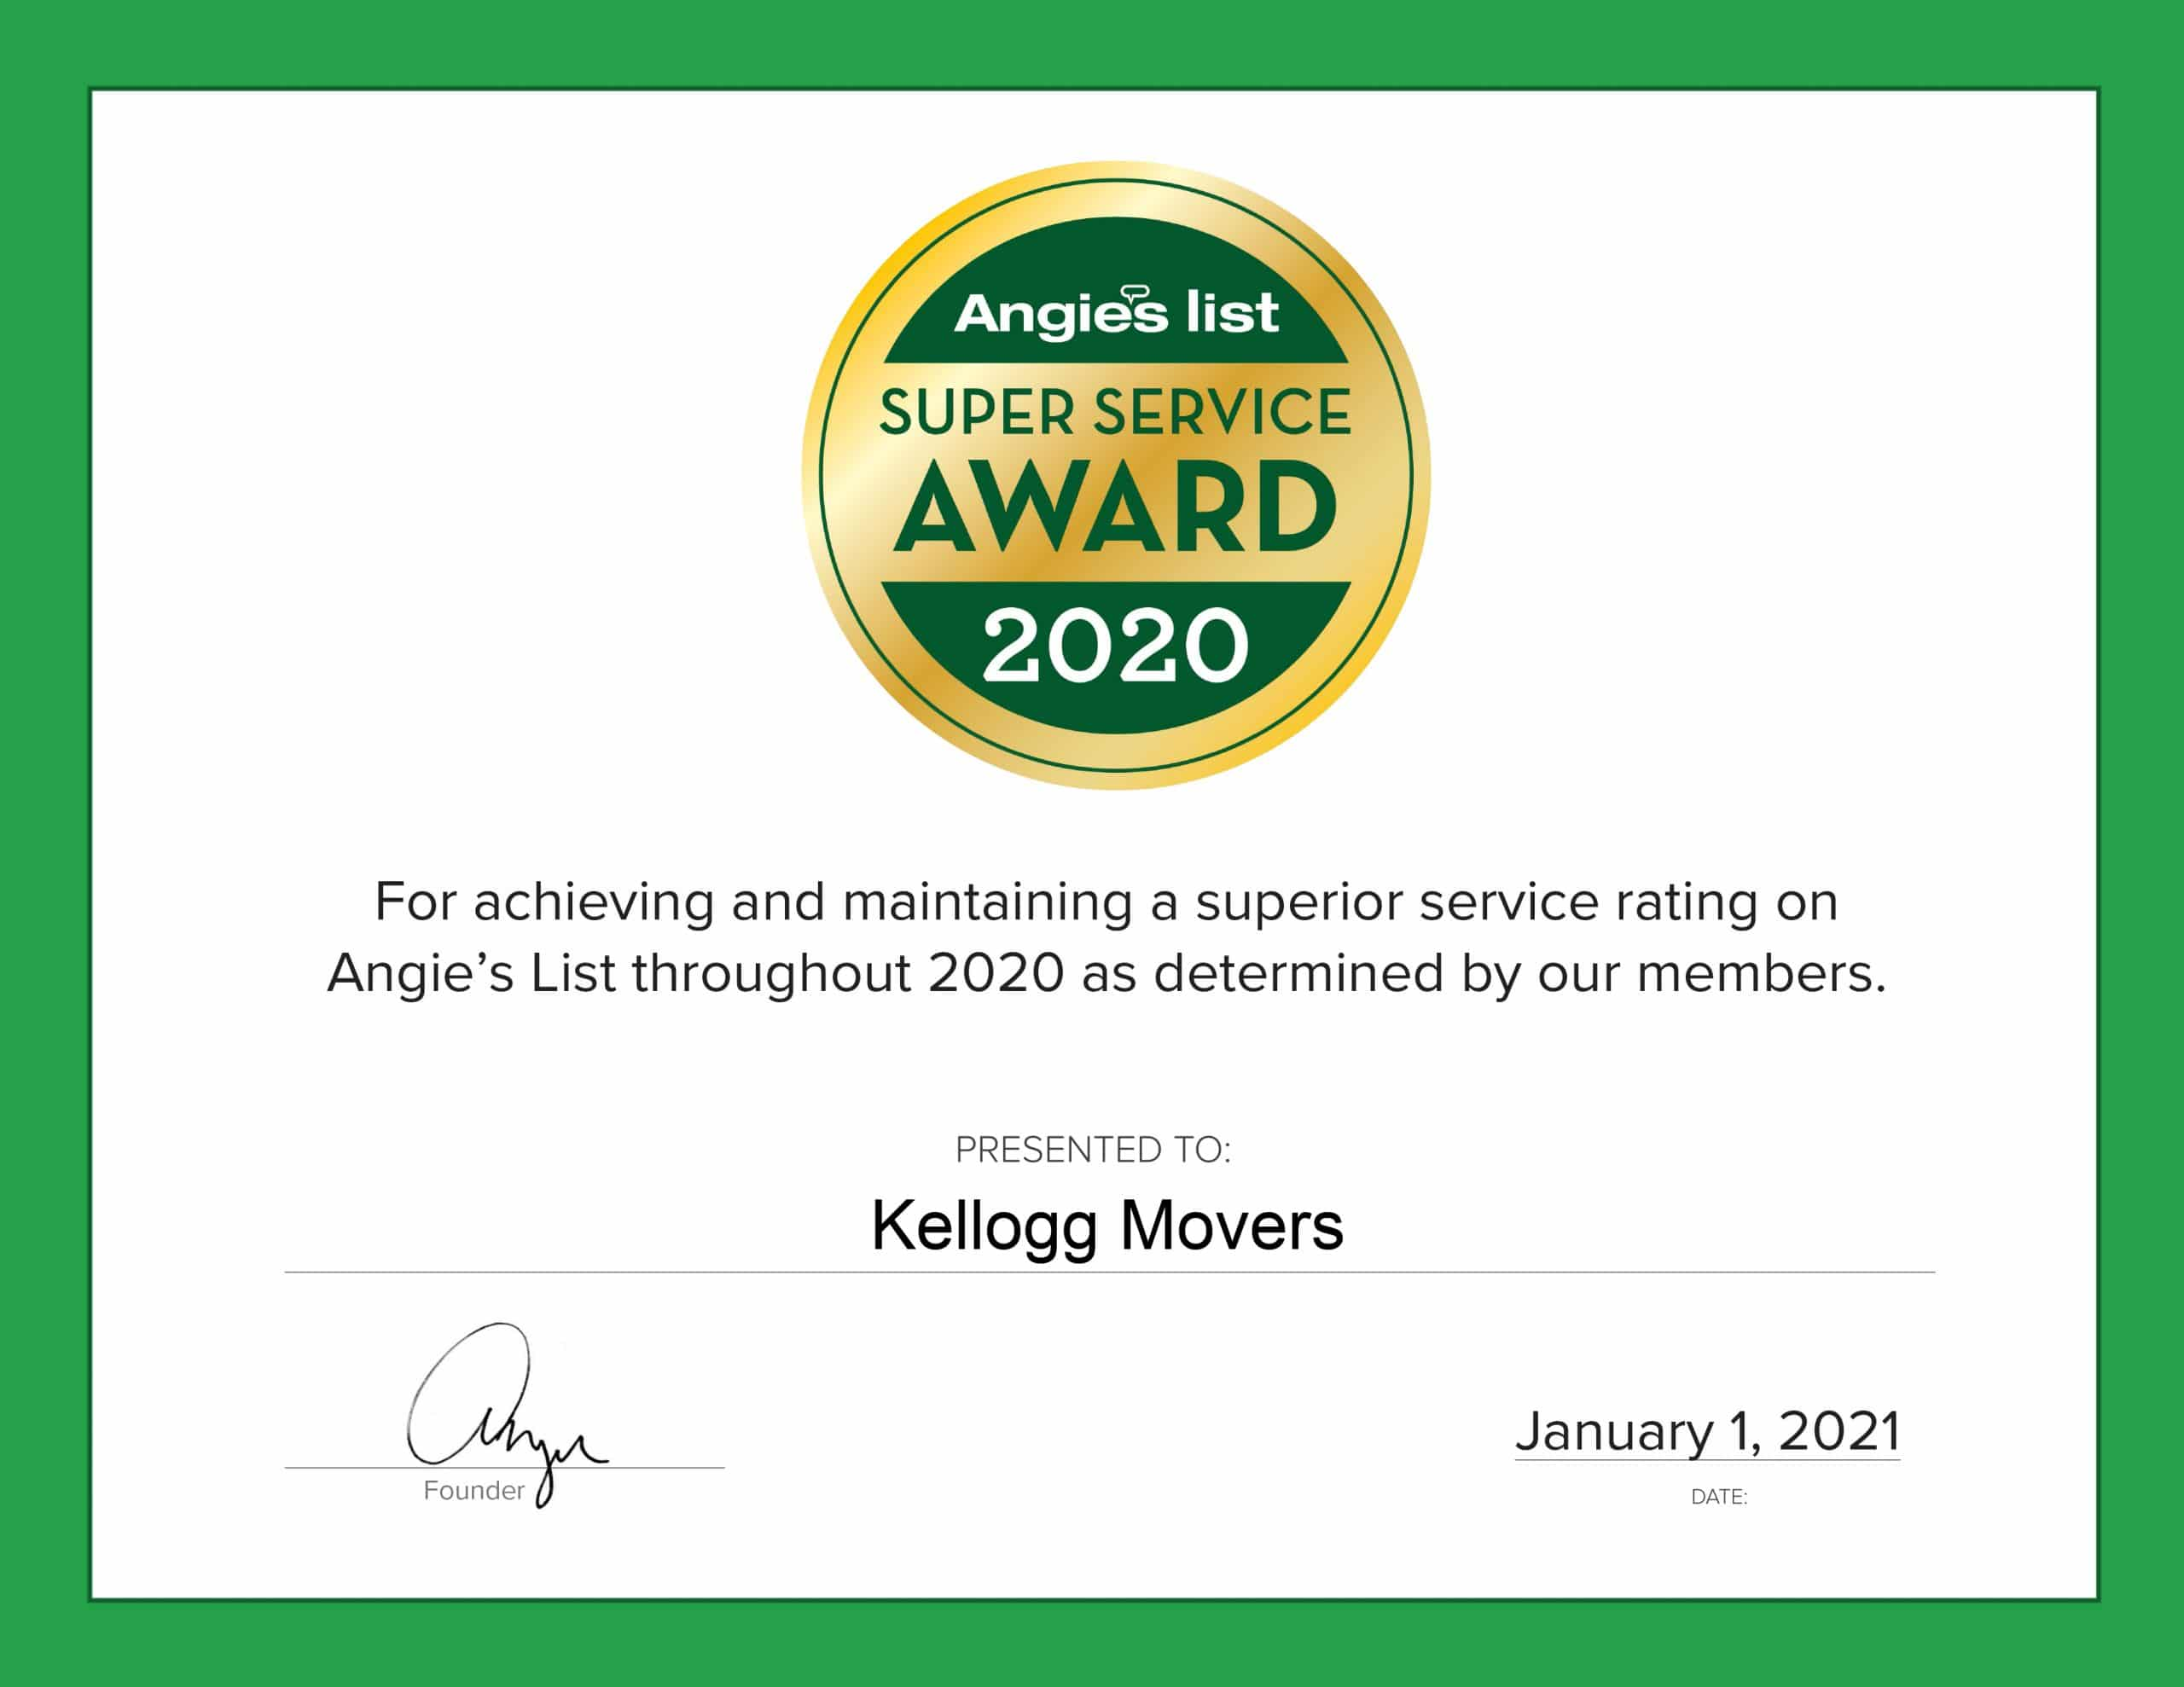 Angies list, Super Service Award, 2020,